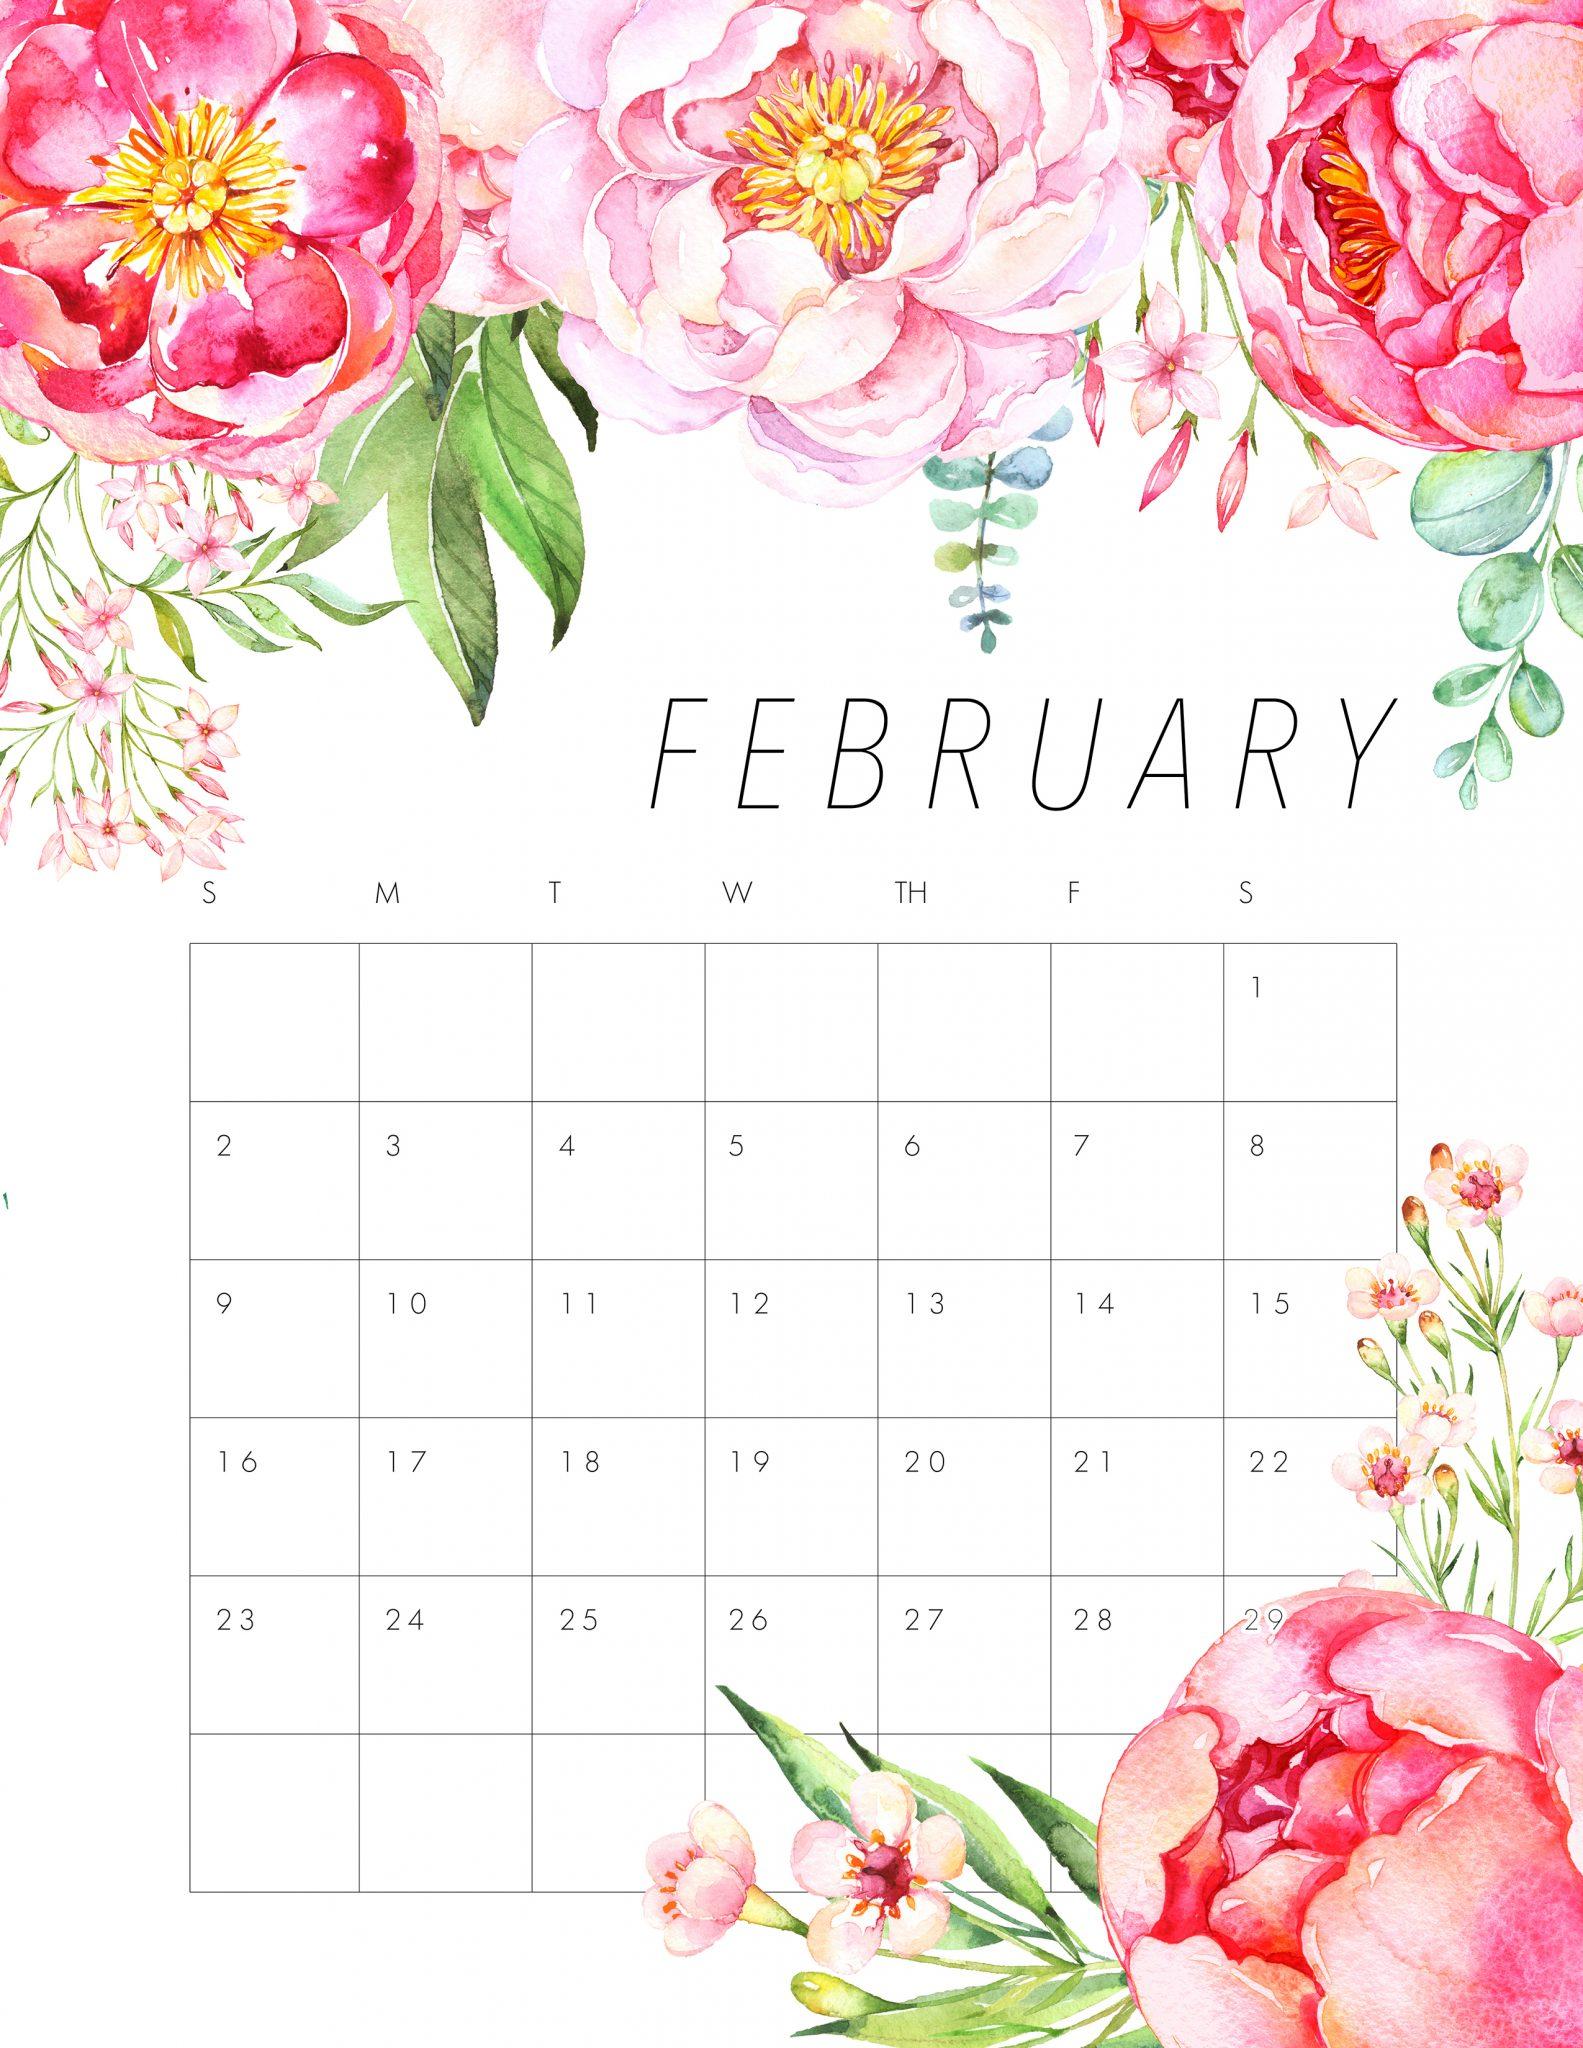 Floral February 2020 Wall Calendar